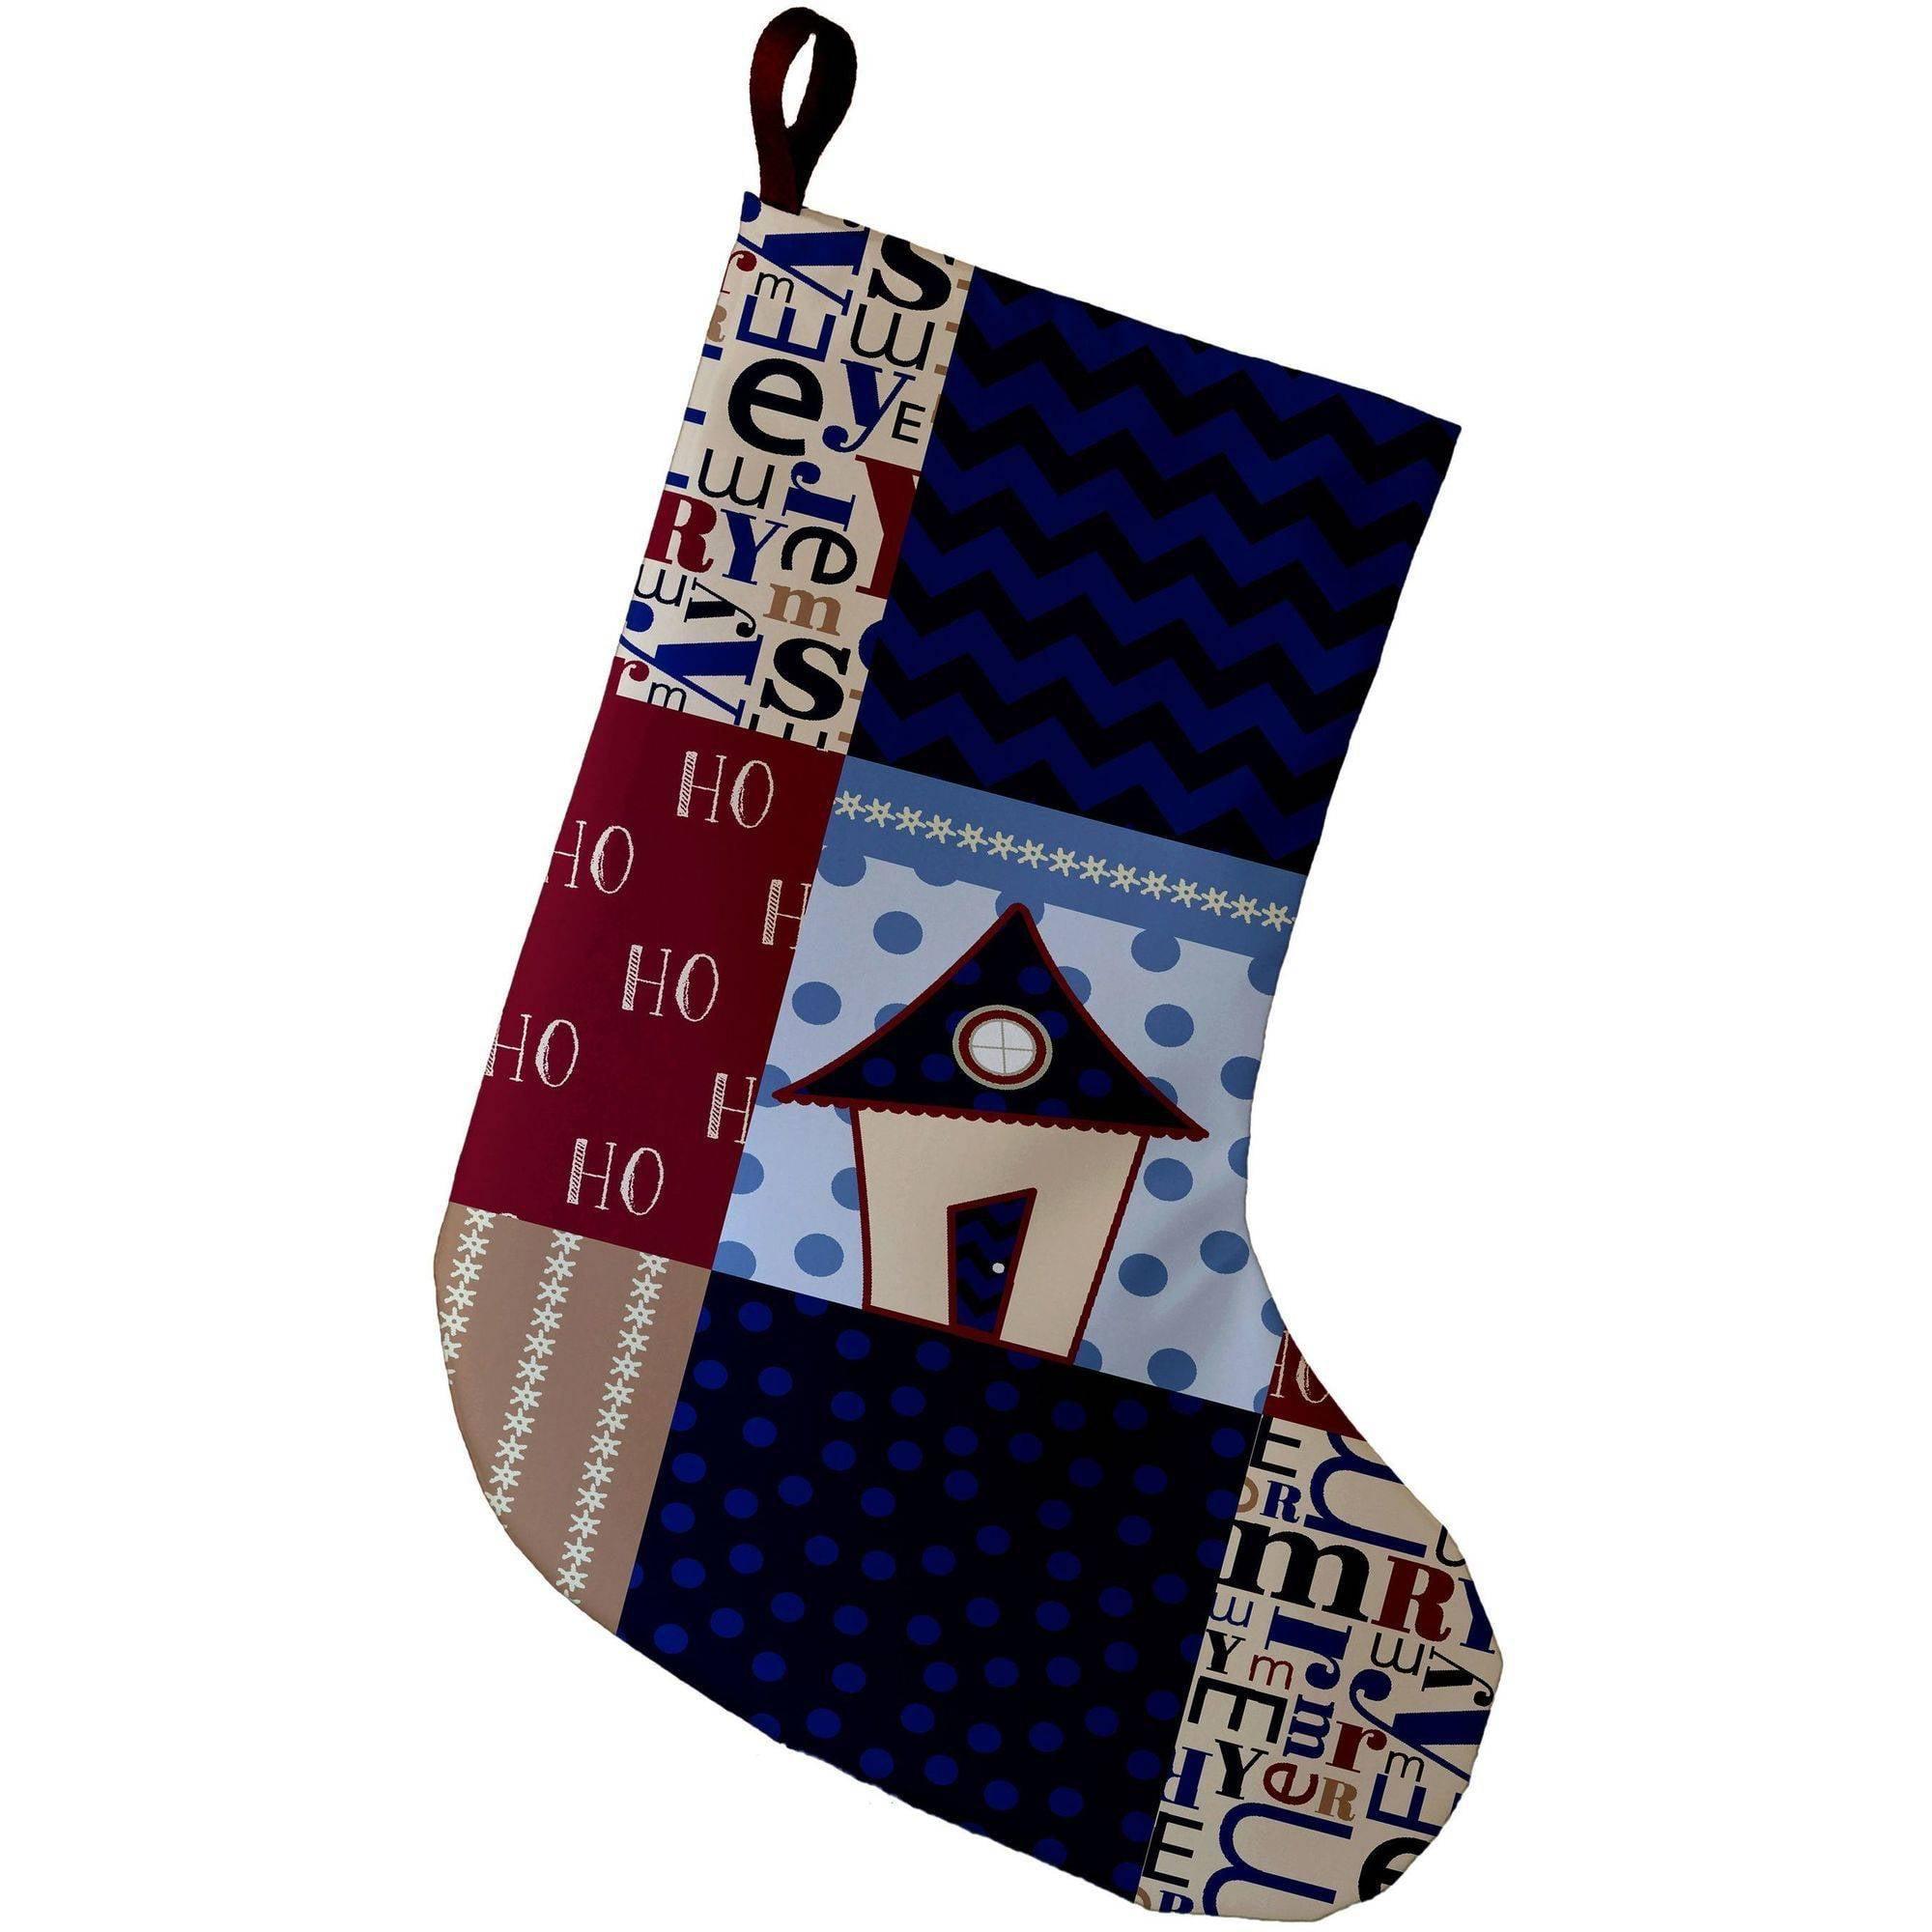 E By Design Simply Daisy, 9 x 16, Merry Coastal Christmas, Decorative Holiday Geometric Print Stocking